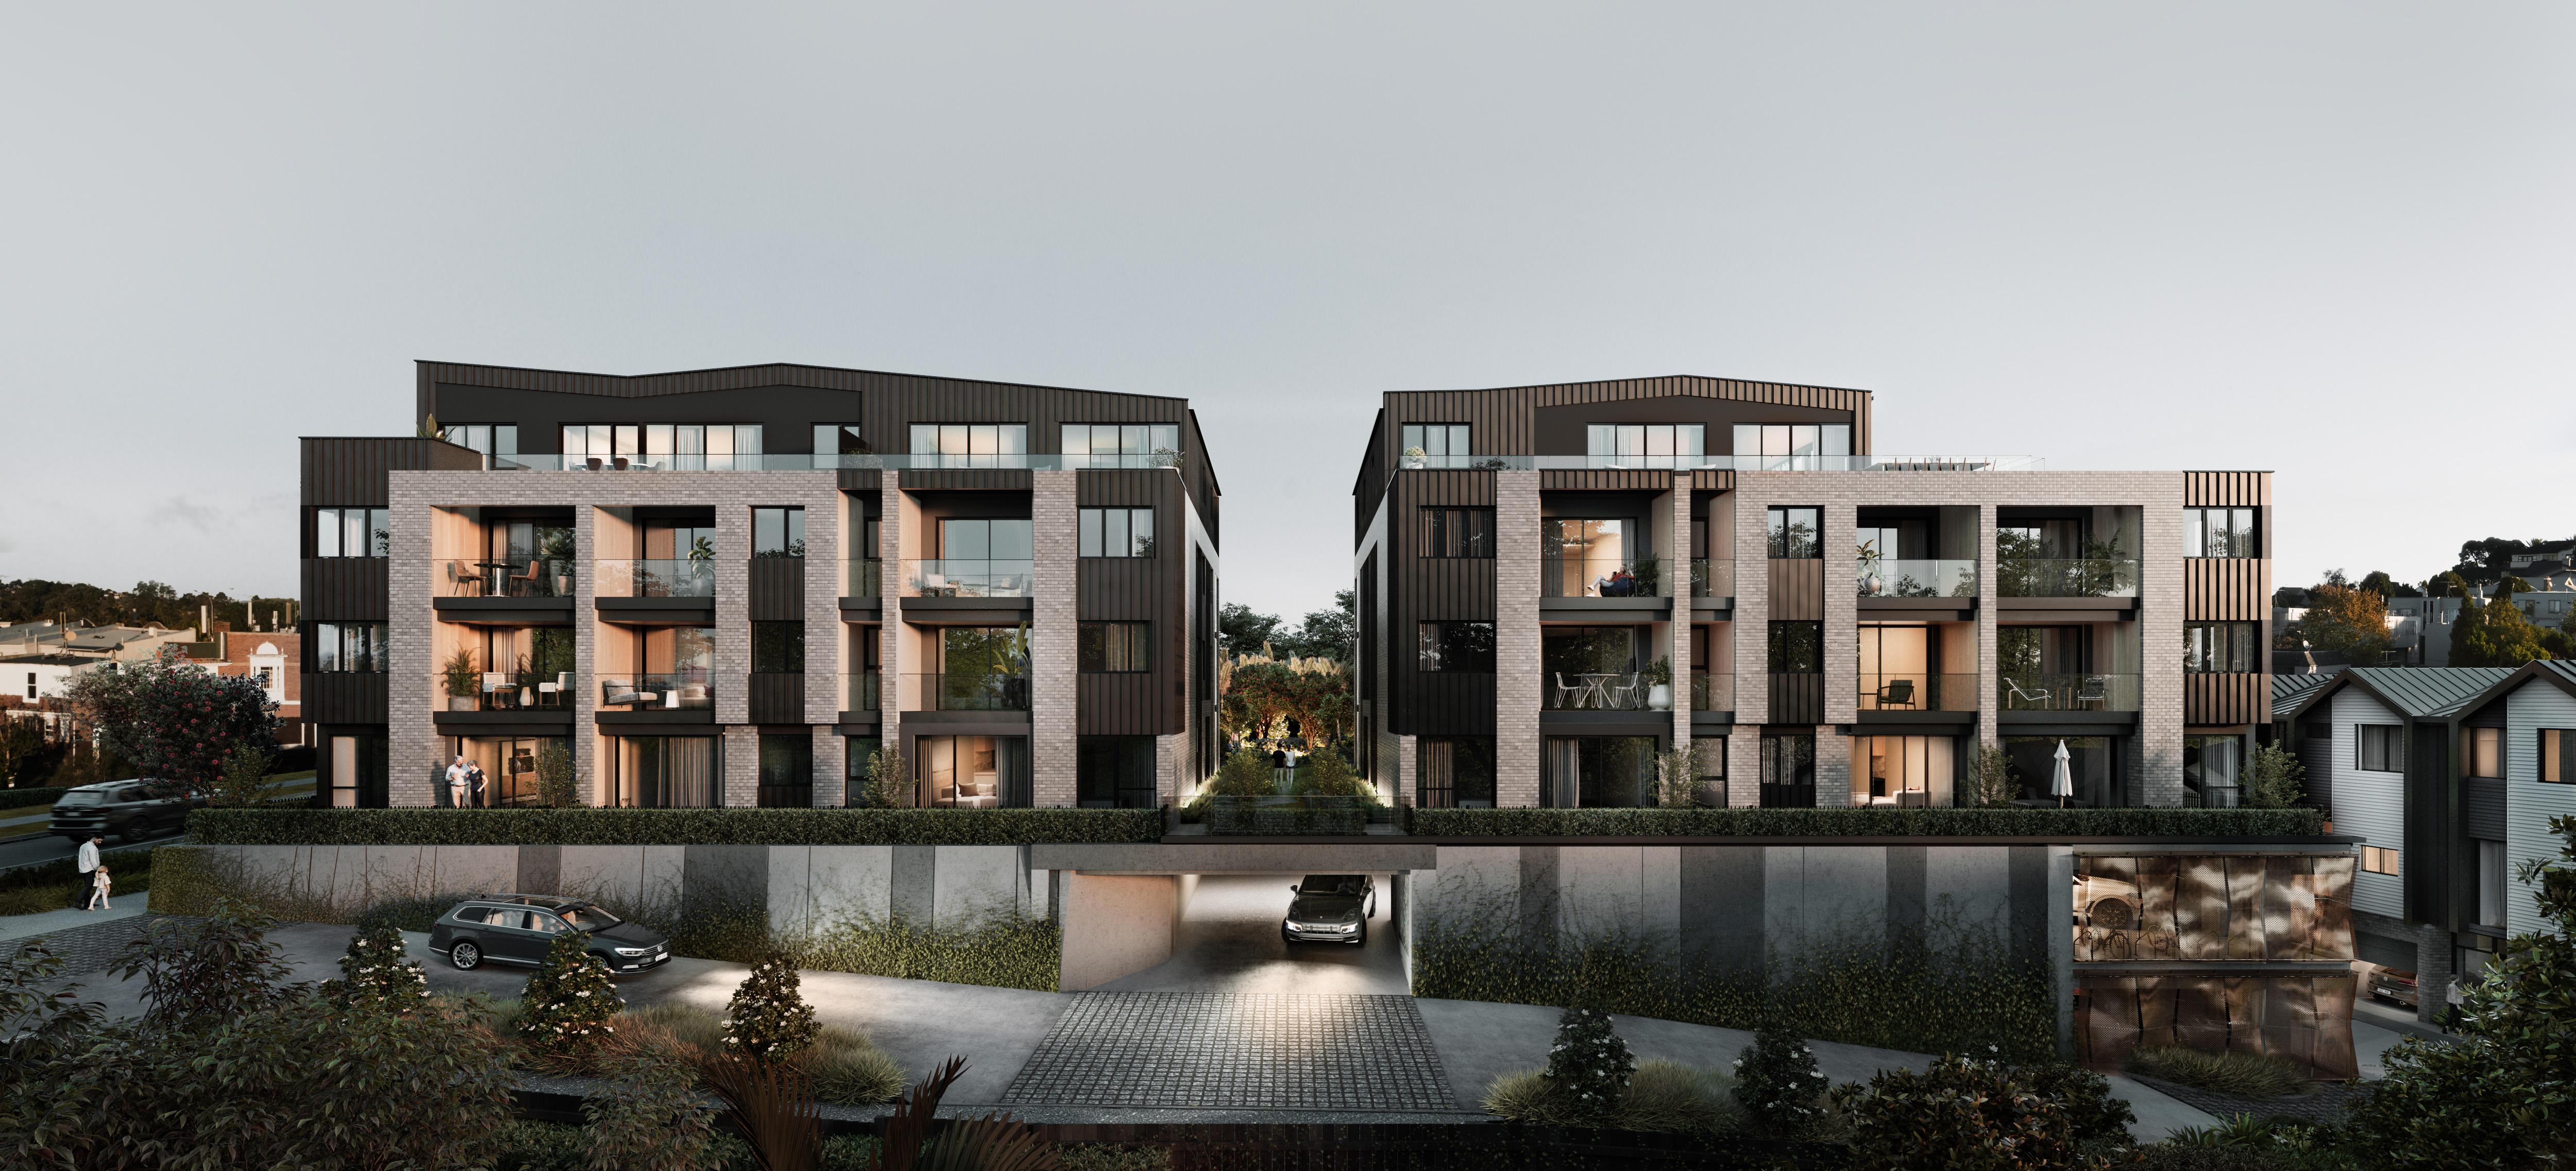 Meadowbank 3房 全新现代开发项目 77套公寓+13套联排住宅 多户型可选 CBD顷刻即达 周边配套醇熟 可轻松上高速 10月即将动工! Risland Meadowbank - brand-new apartments and ...